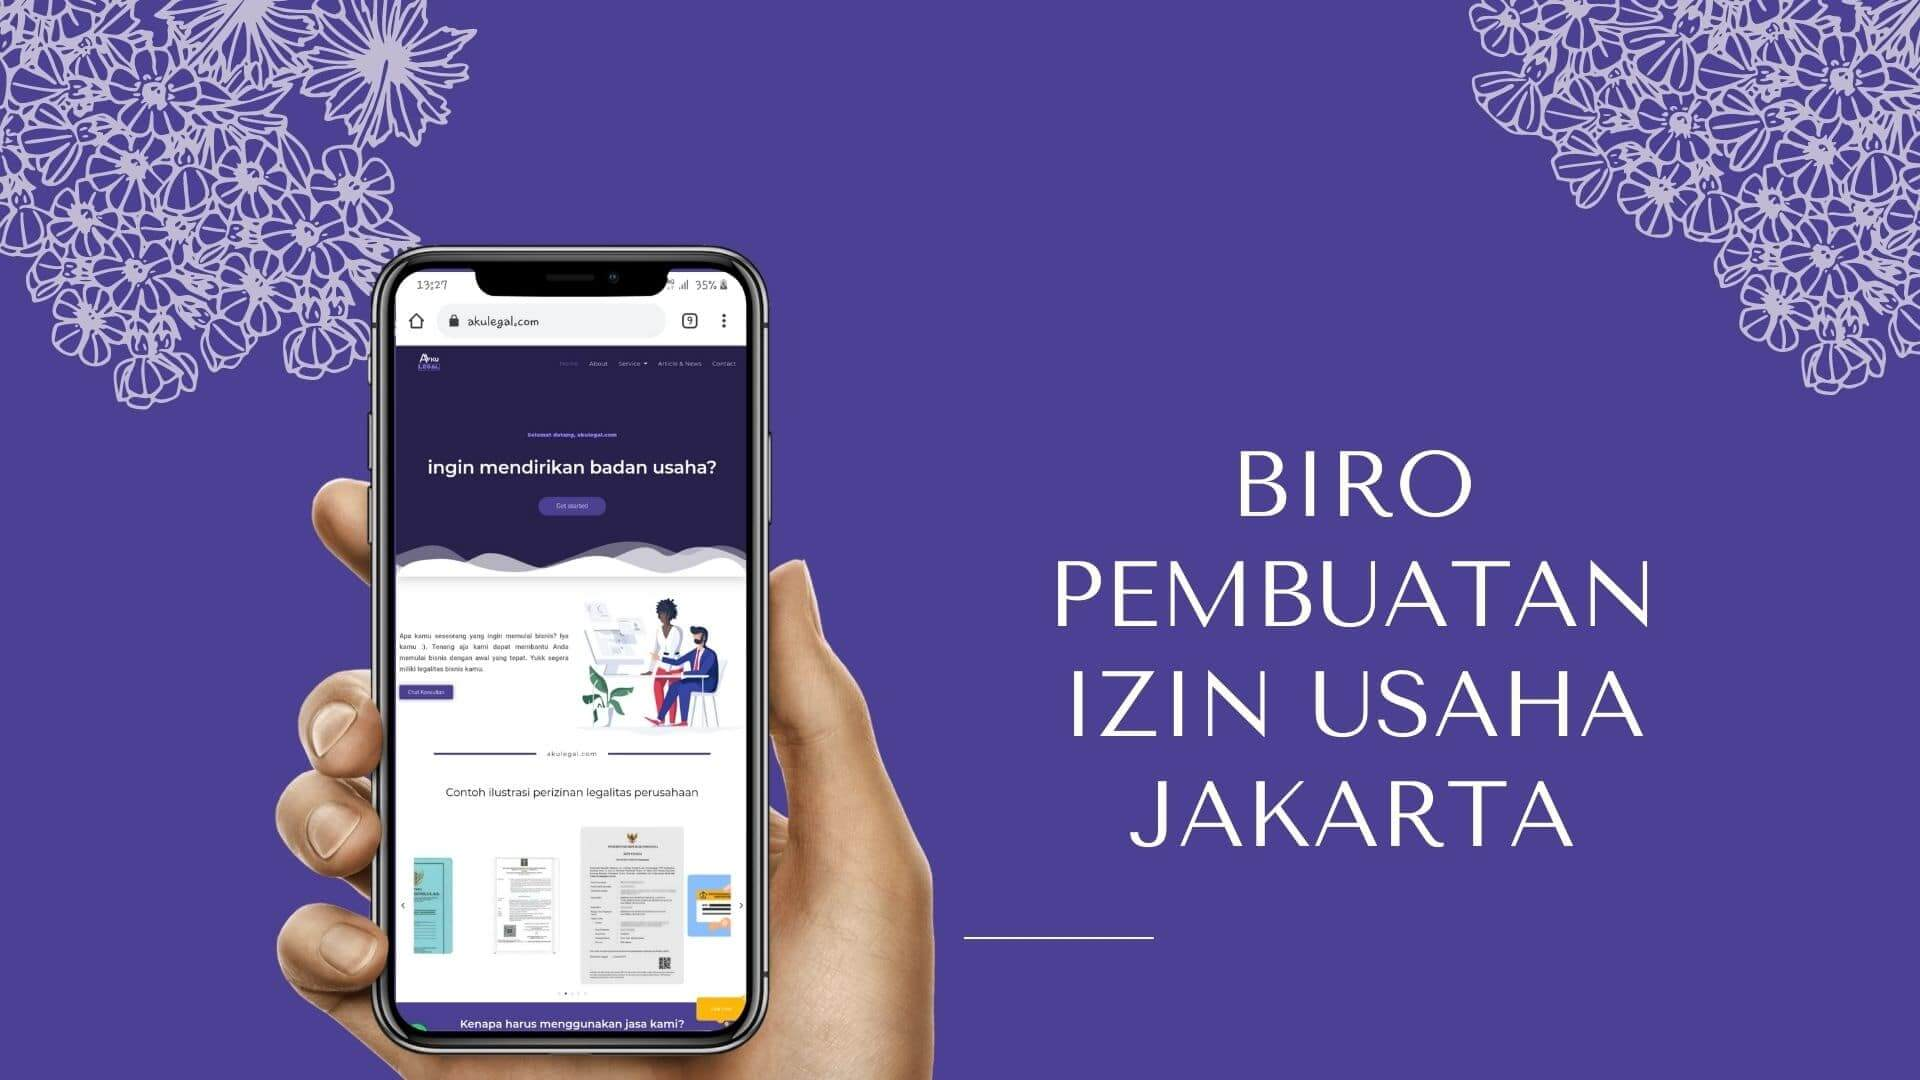 Biro Pembuatan Izin Usaha Jakarta